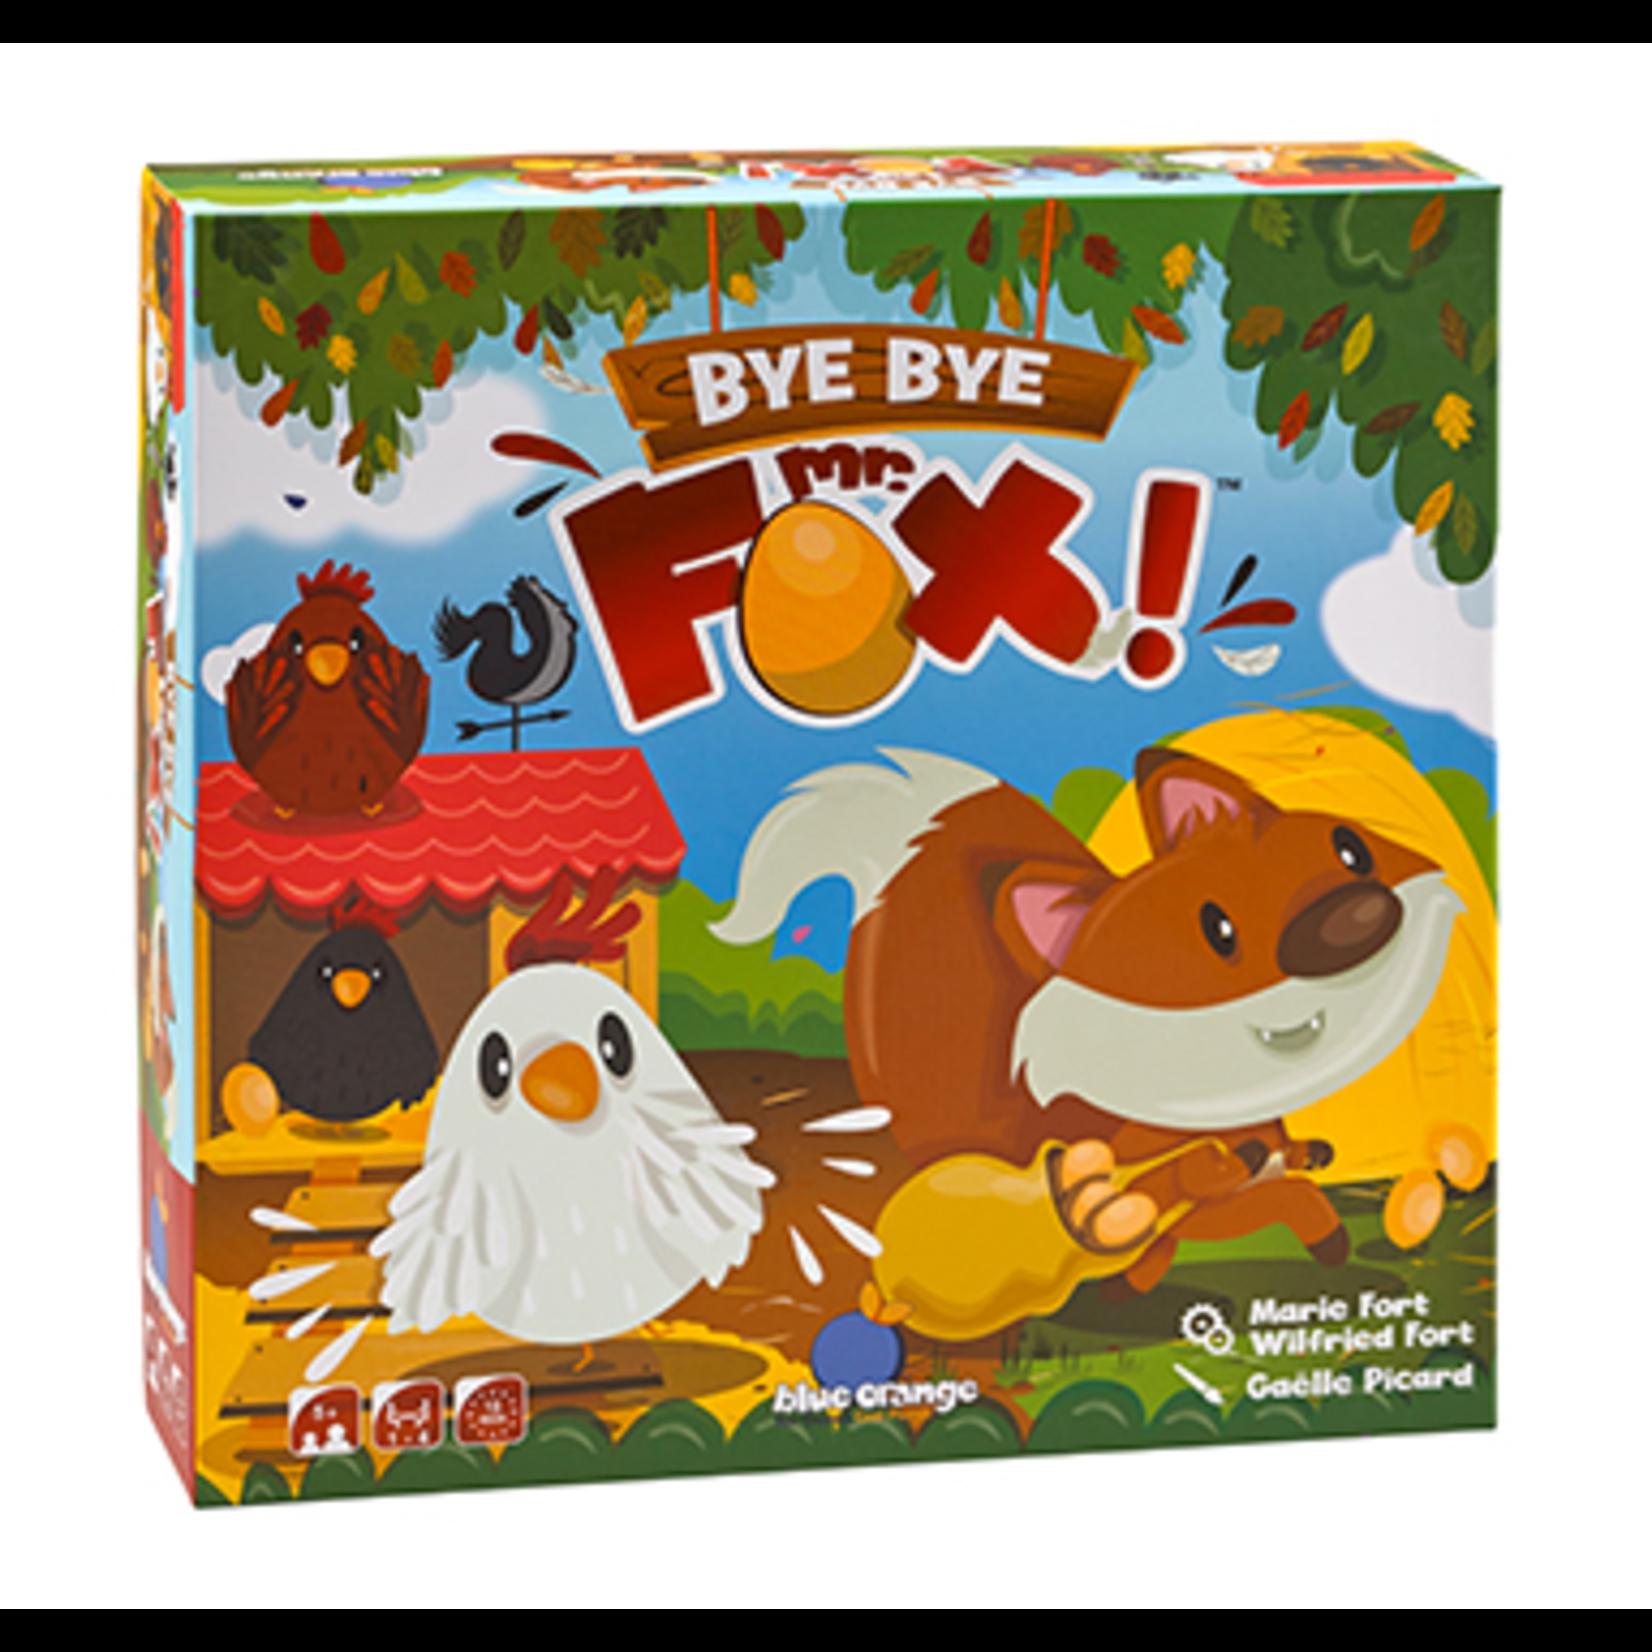 Blue Orange Games Bye Bye Mr Fox